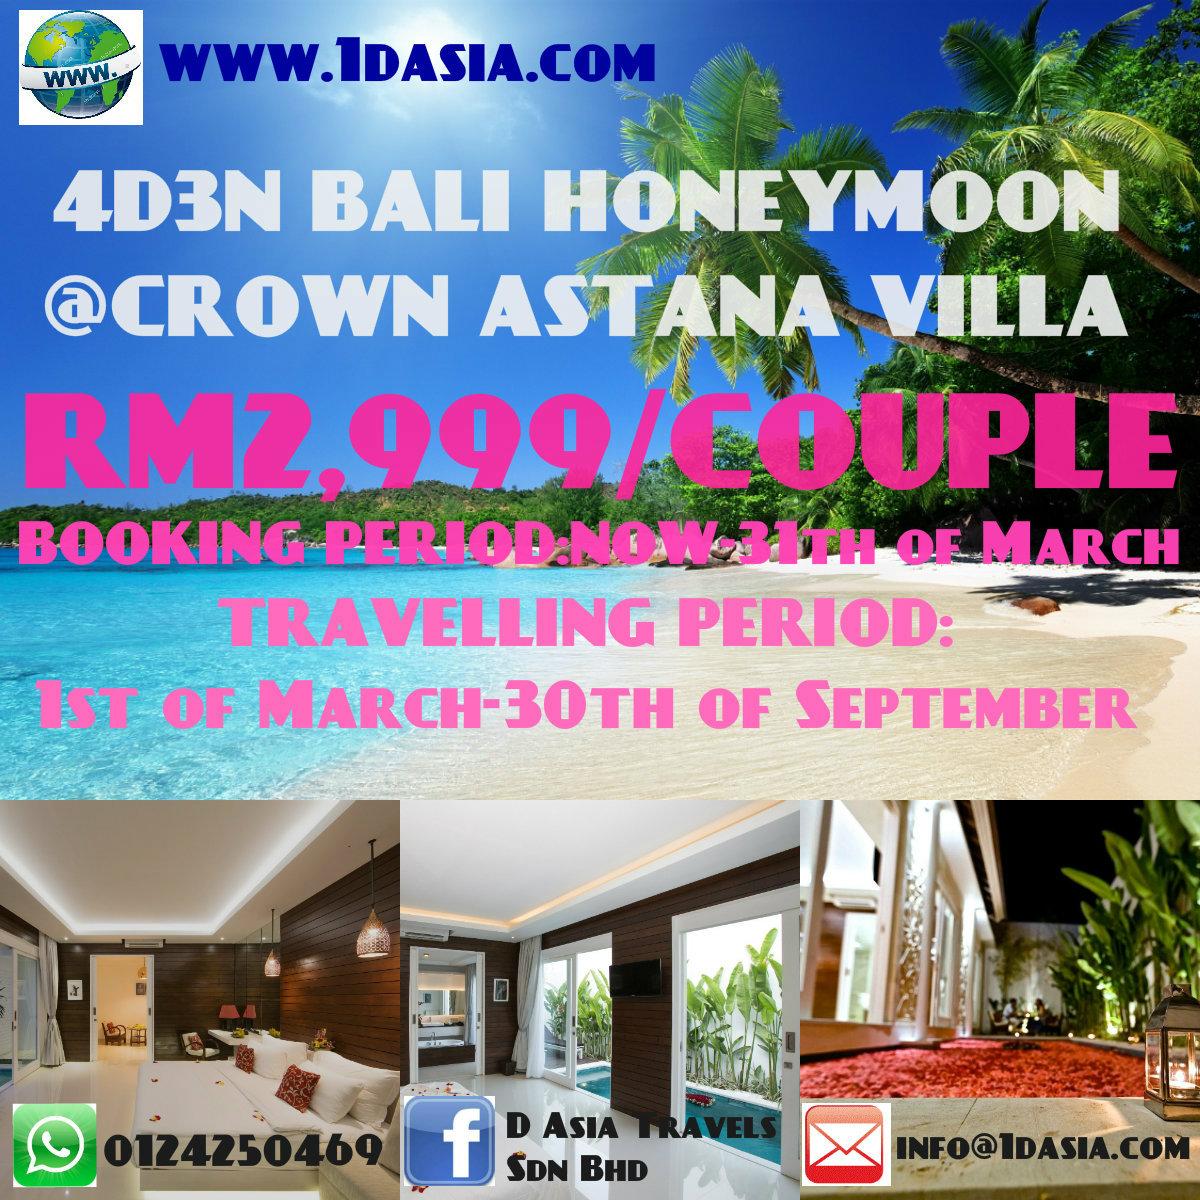 4D3N Bali Honeymoon Turtle Island